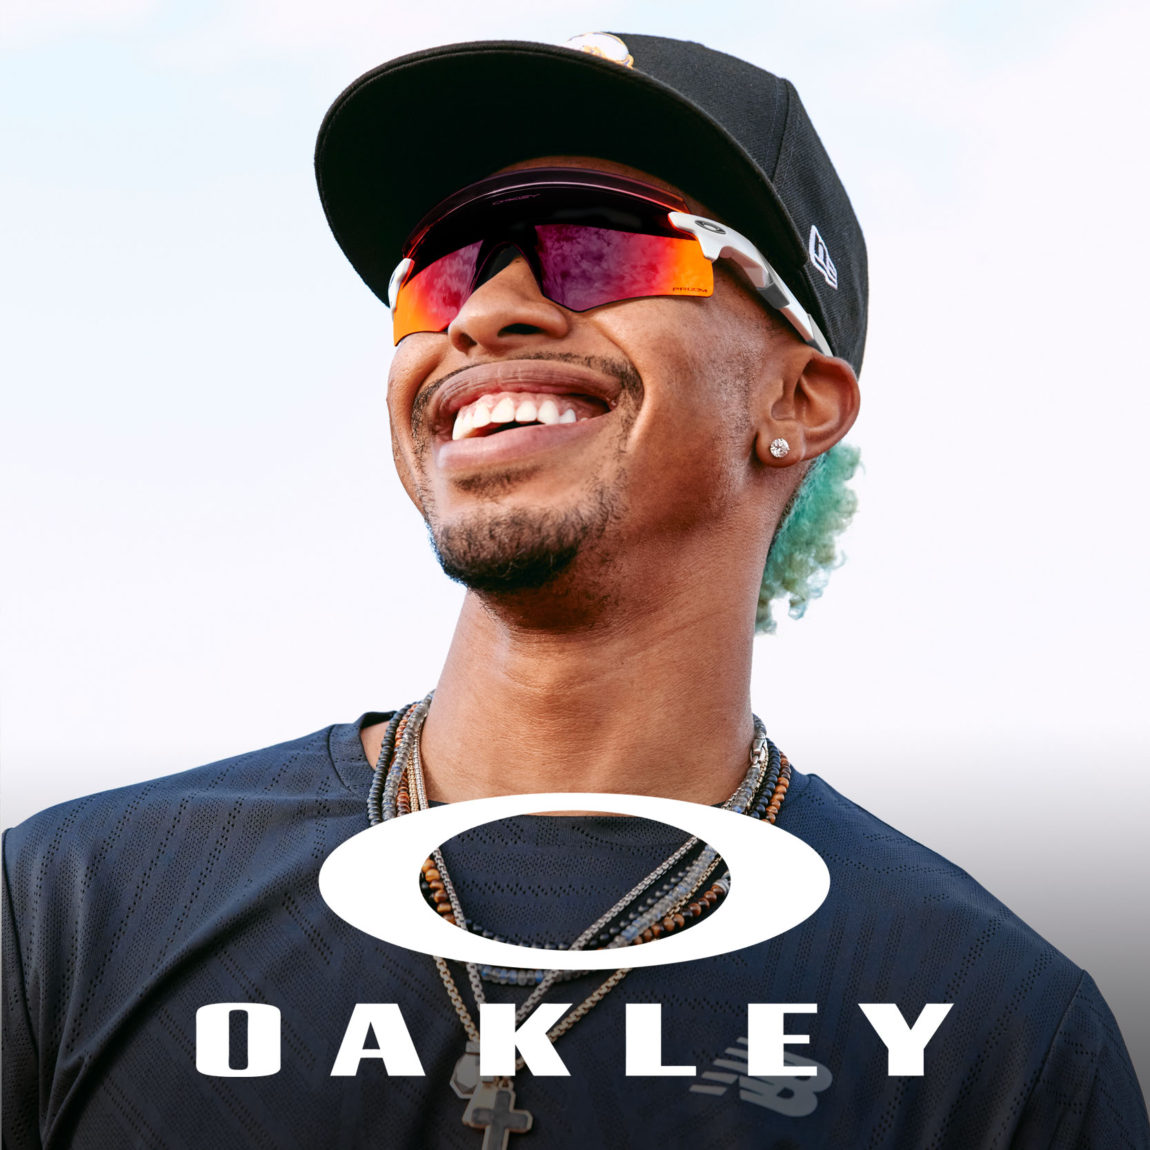 Oakley Encoder Experience